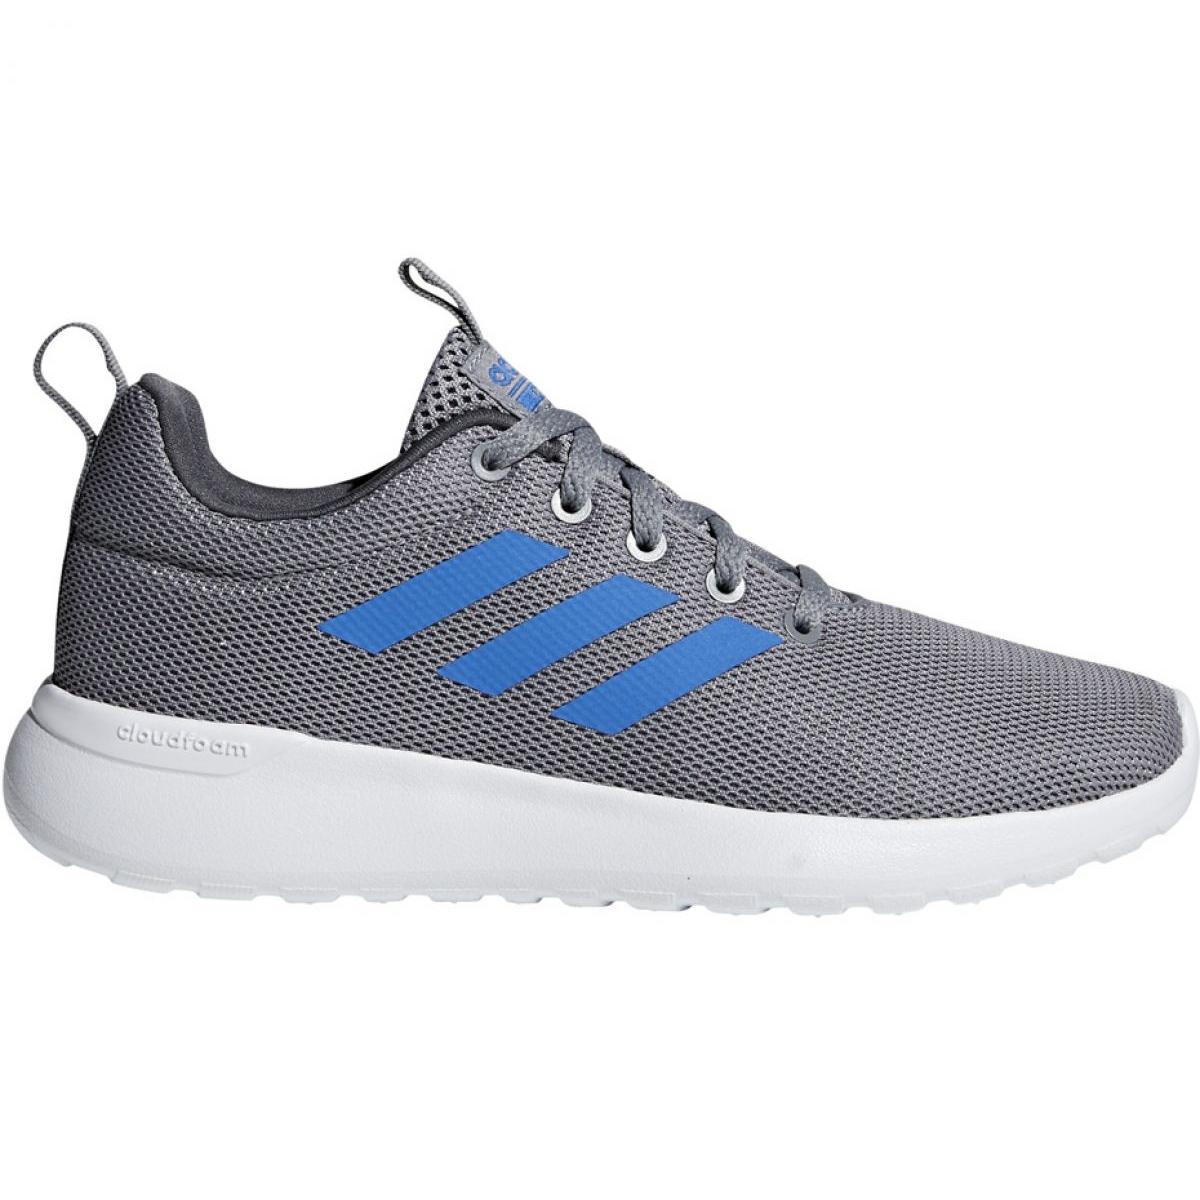 Schuhe für adidas Lite Racer K grau blau Jr F35440